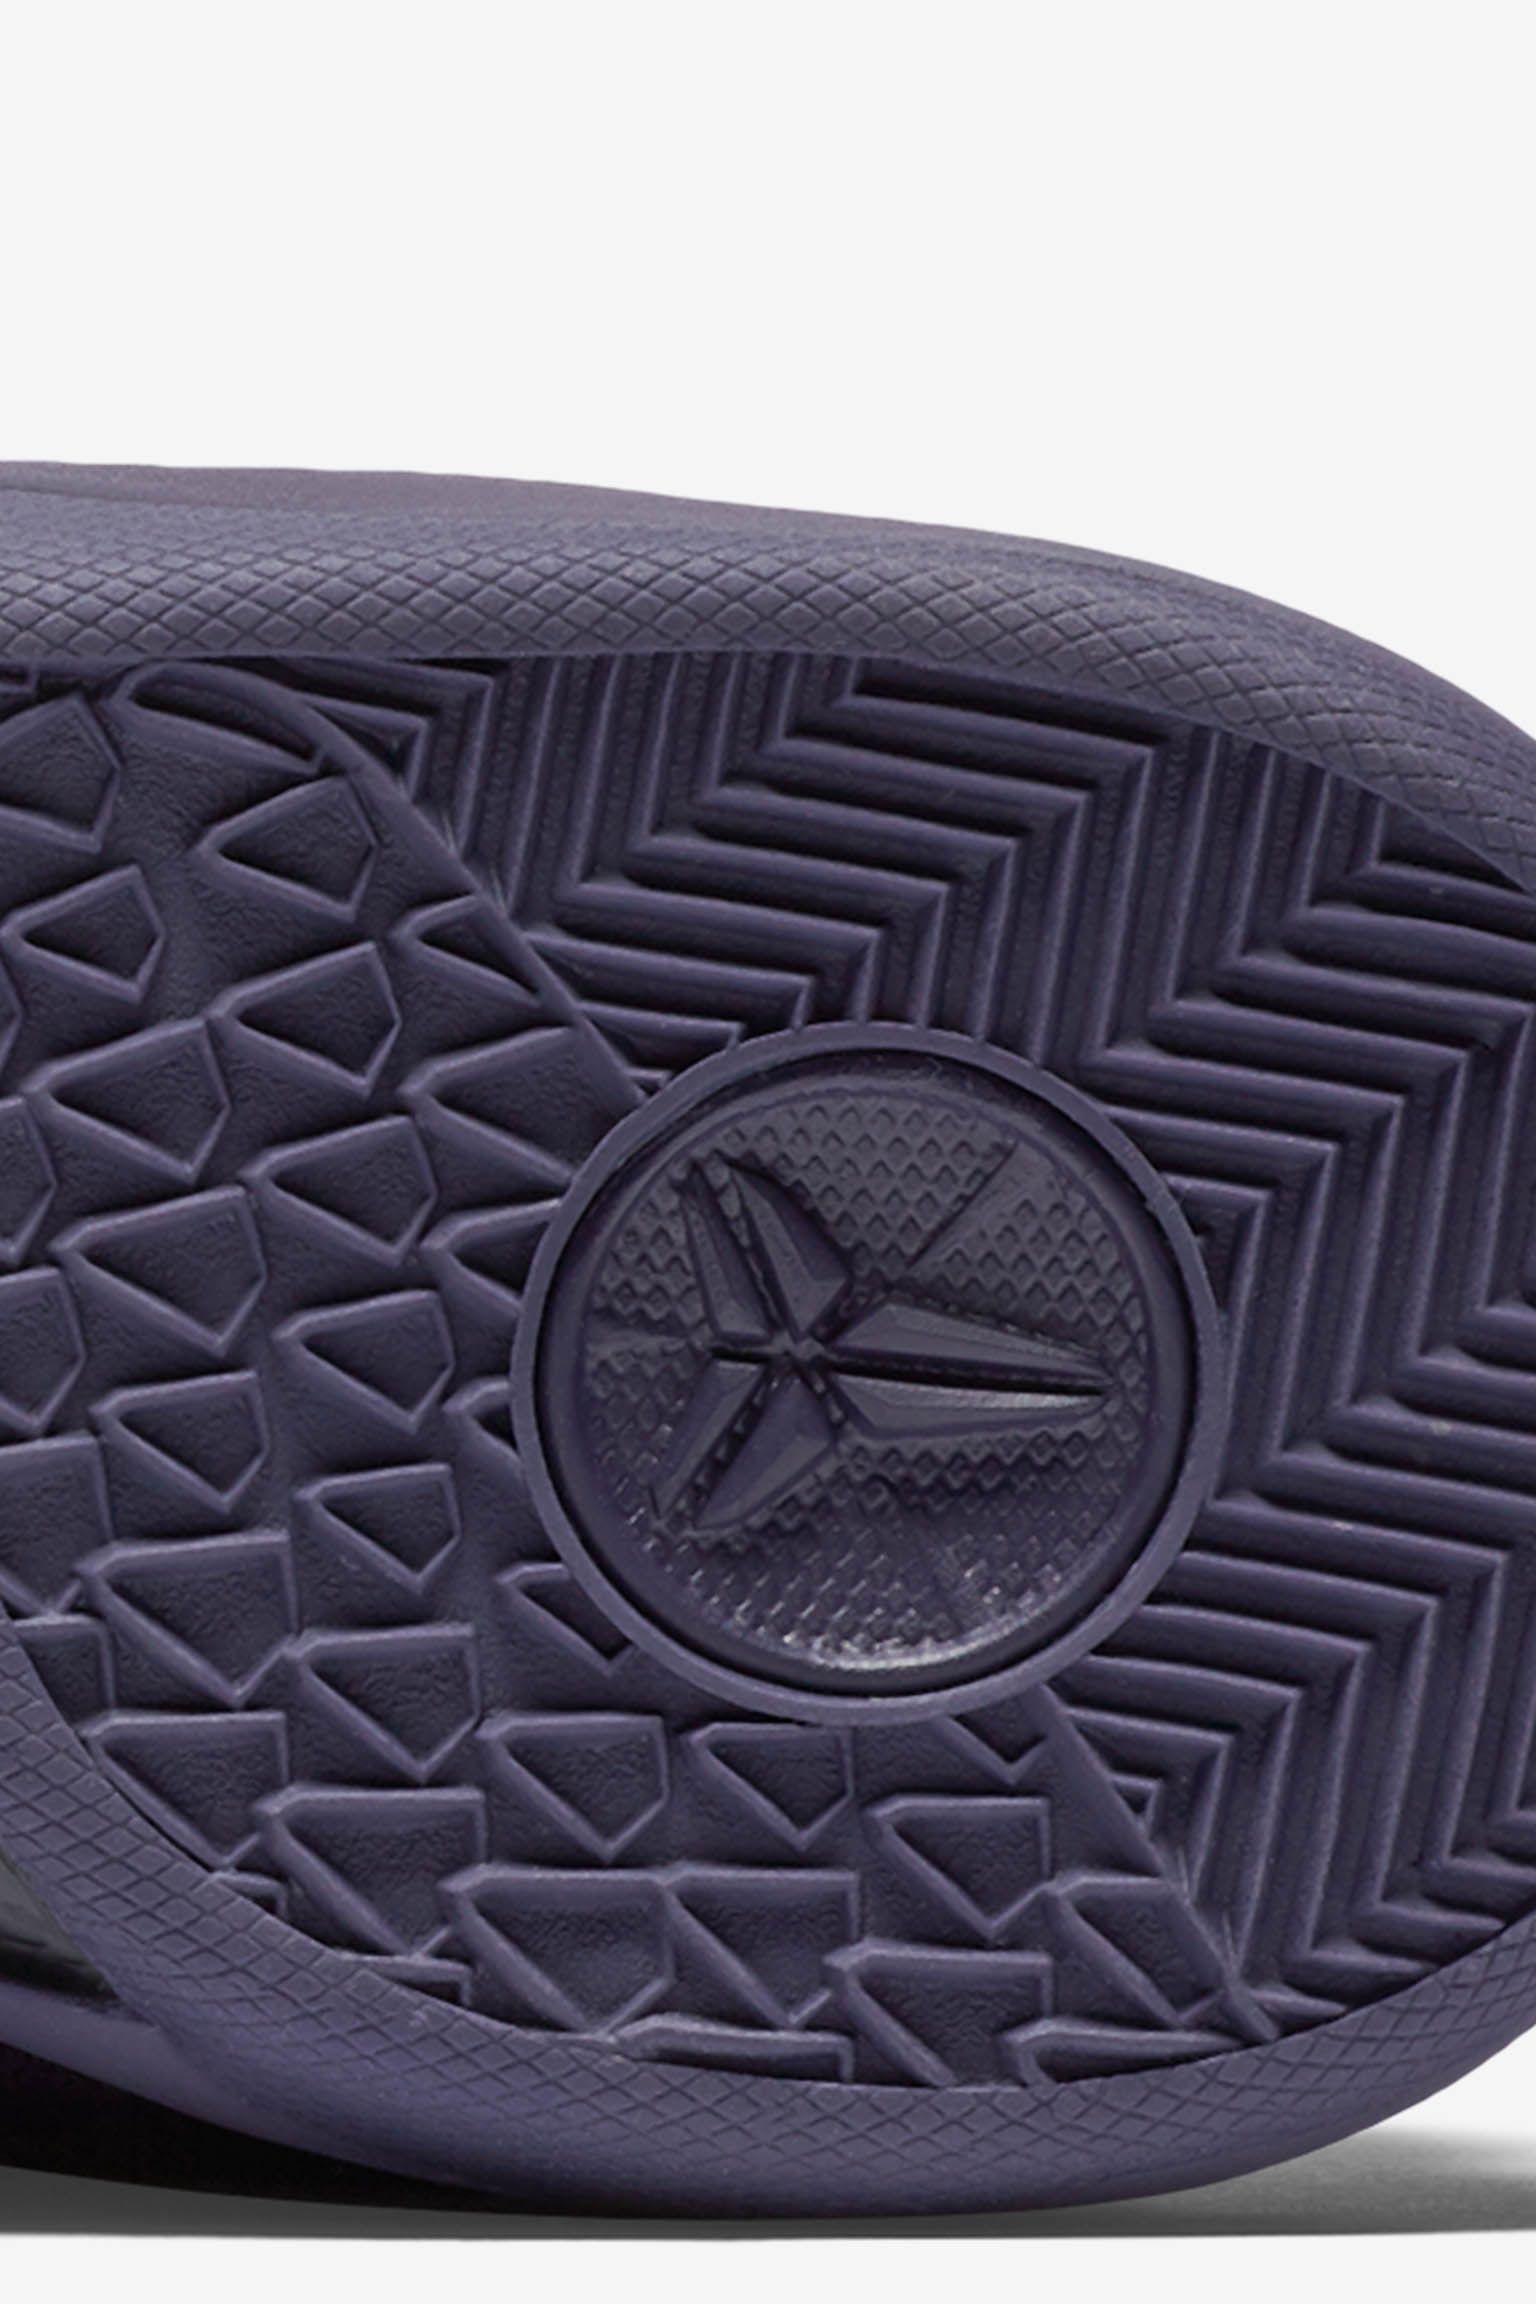 Nike Kobe 8 'FTB' Release Date